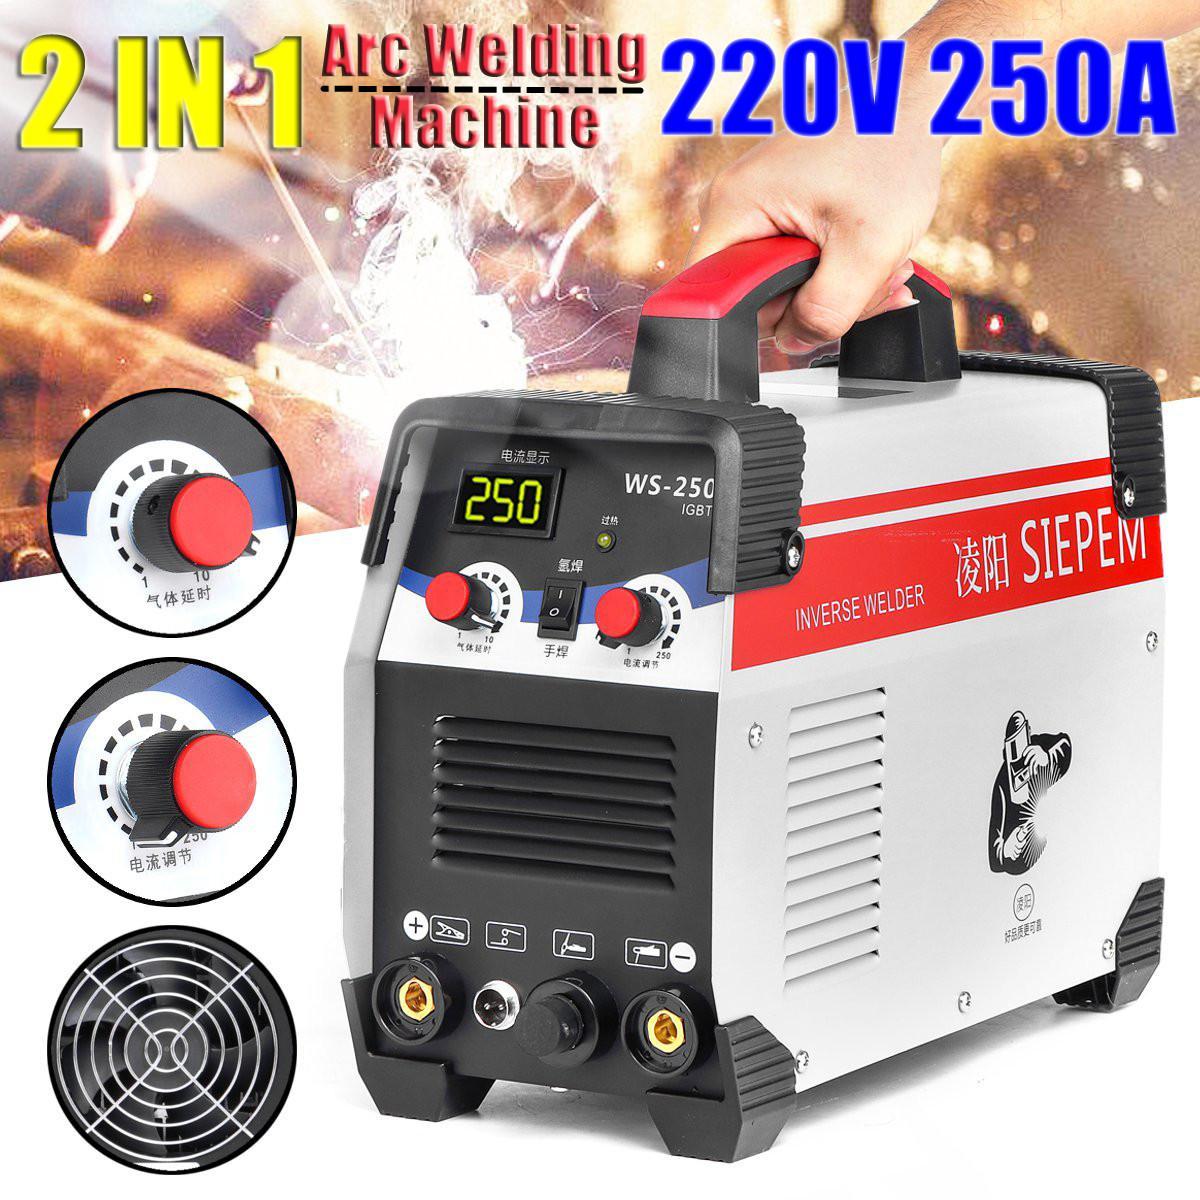 Equipo de soldadura eléctrica 2 en 1 ARC/TIG IGBT Inverter Arc 220V 250A MMA